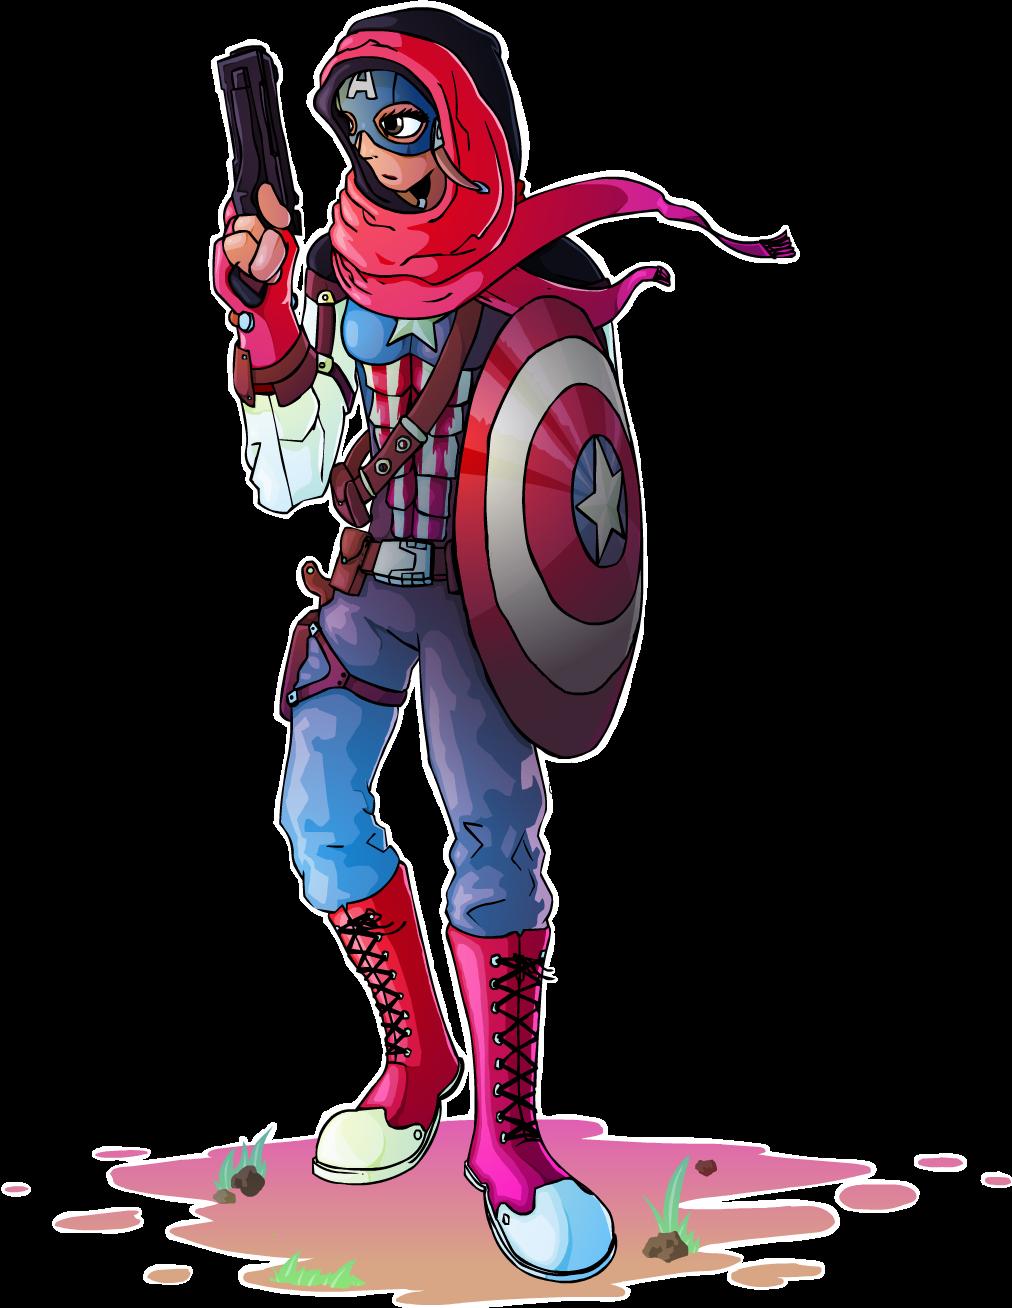 Amovible as Captain America